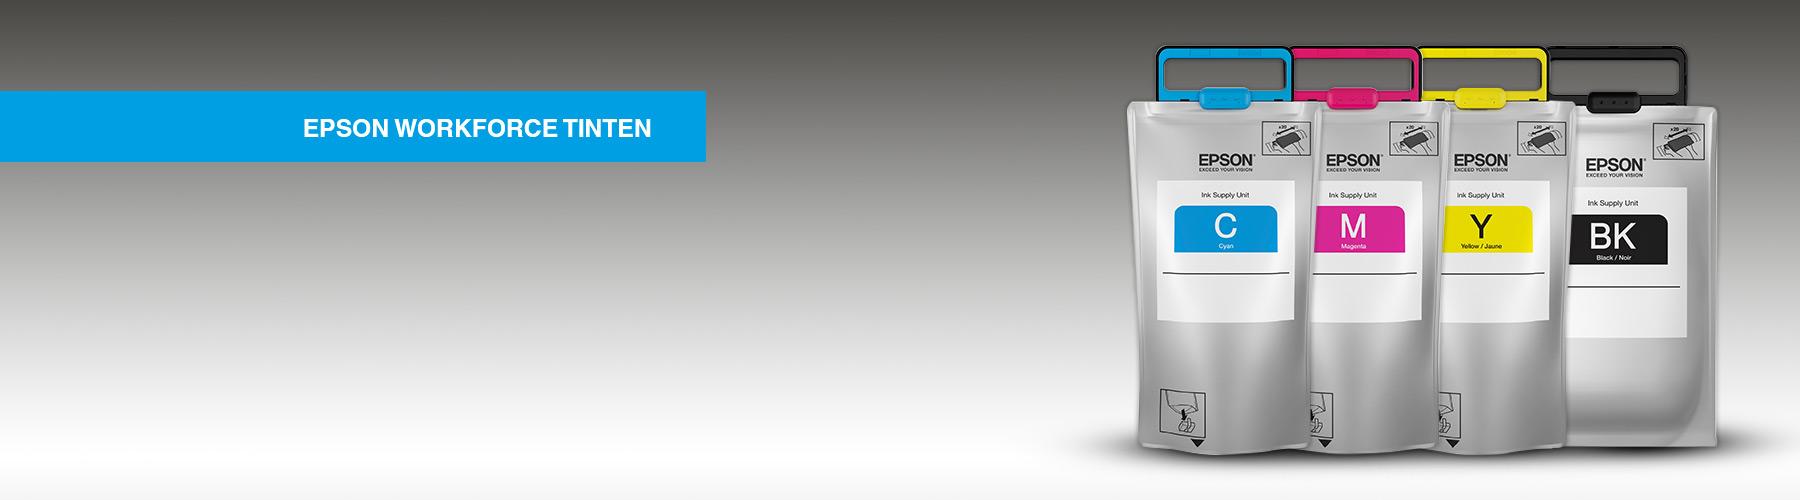 EPSON Workforce Tinten />